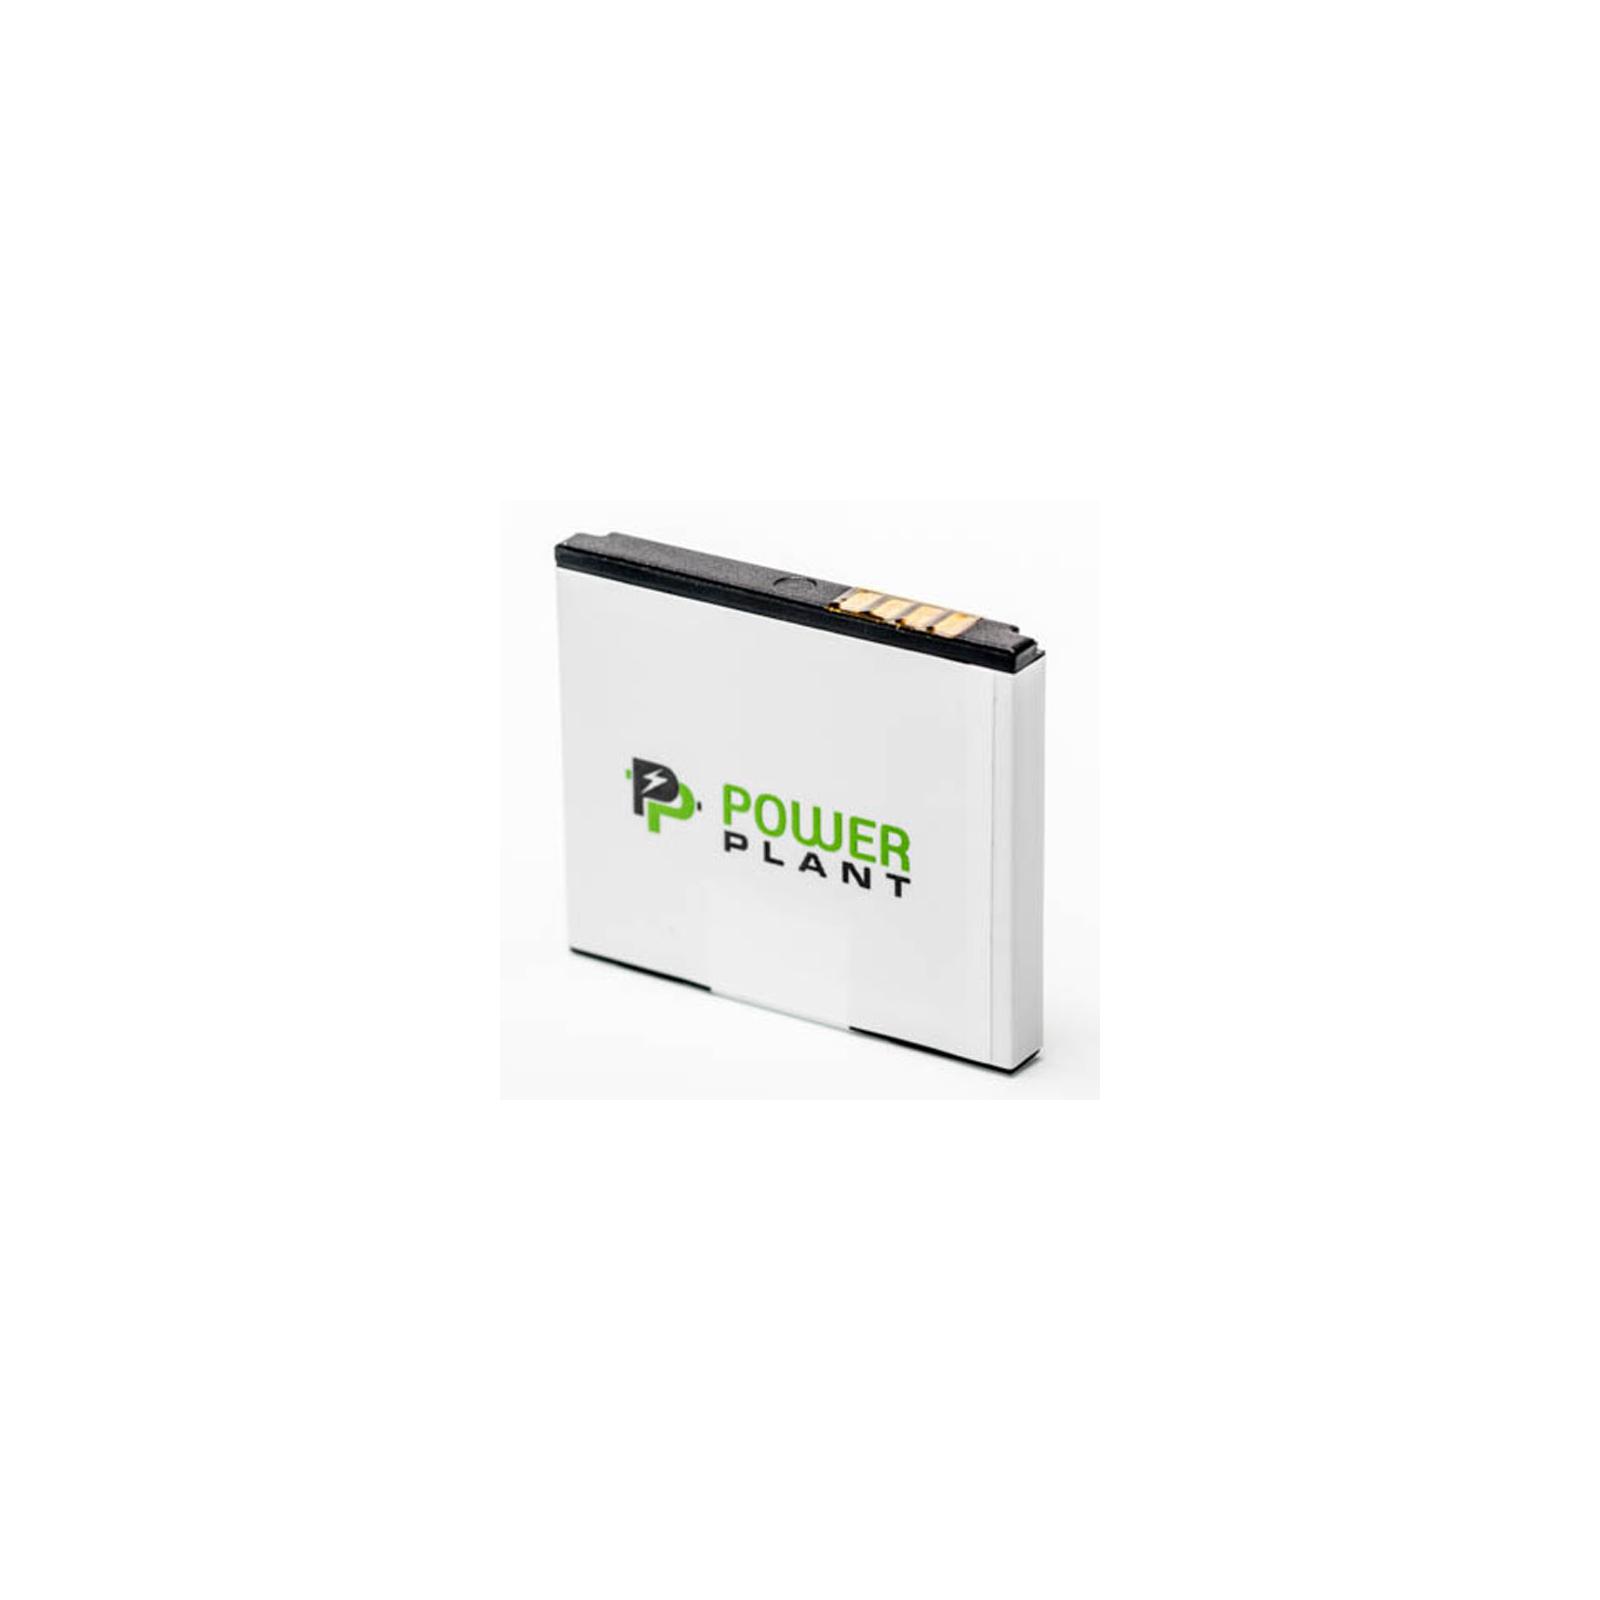 Аккумуляторная батарея PowerPlant LG IP-470A (GM210, KF970, KE970, KF600, KF750, KF600) (DV00DV6096) изображение 2